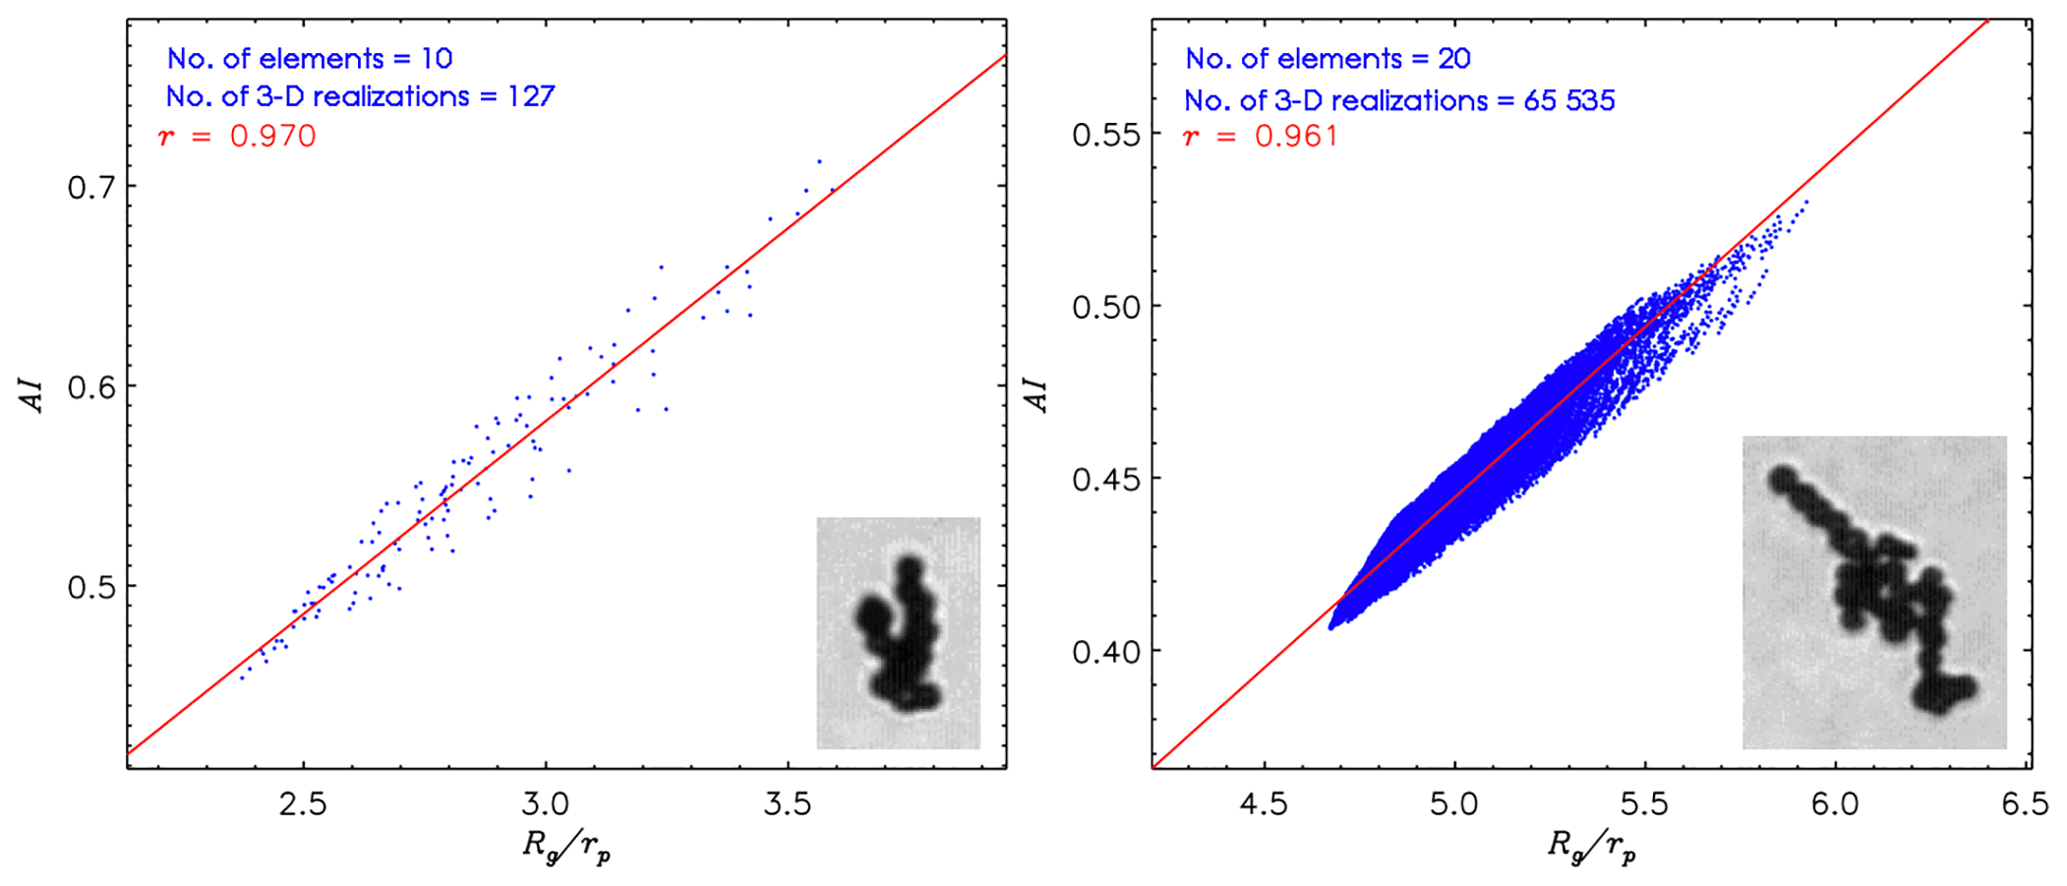 Acp Microphysical Characteristics Of Frozen Droplet Aggregates Schumacher Se 1520 Wiring Diagram Https 18